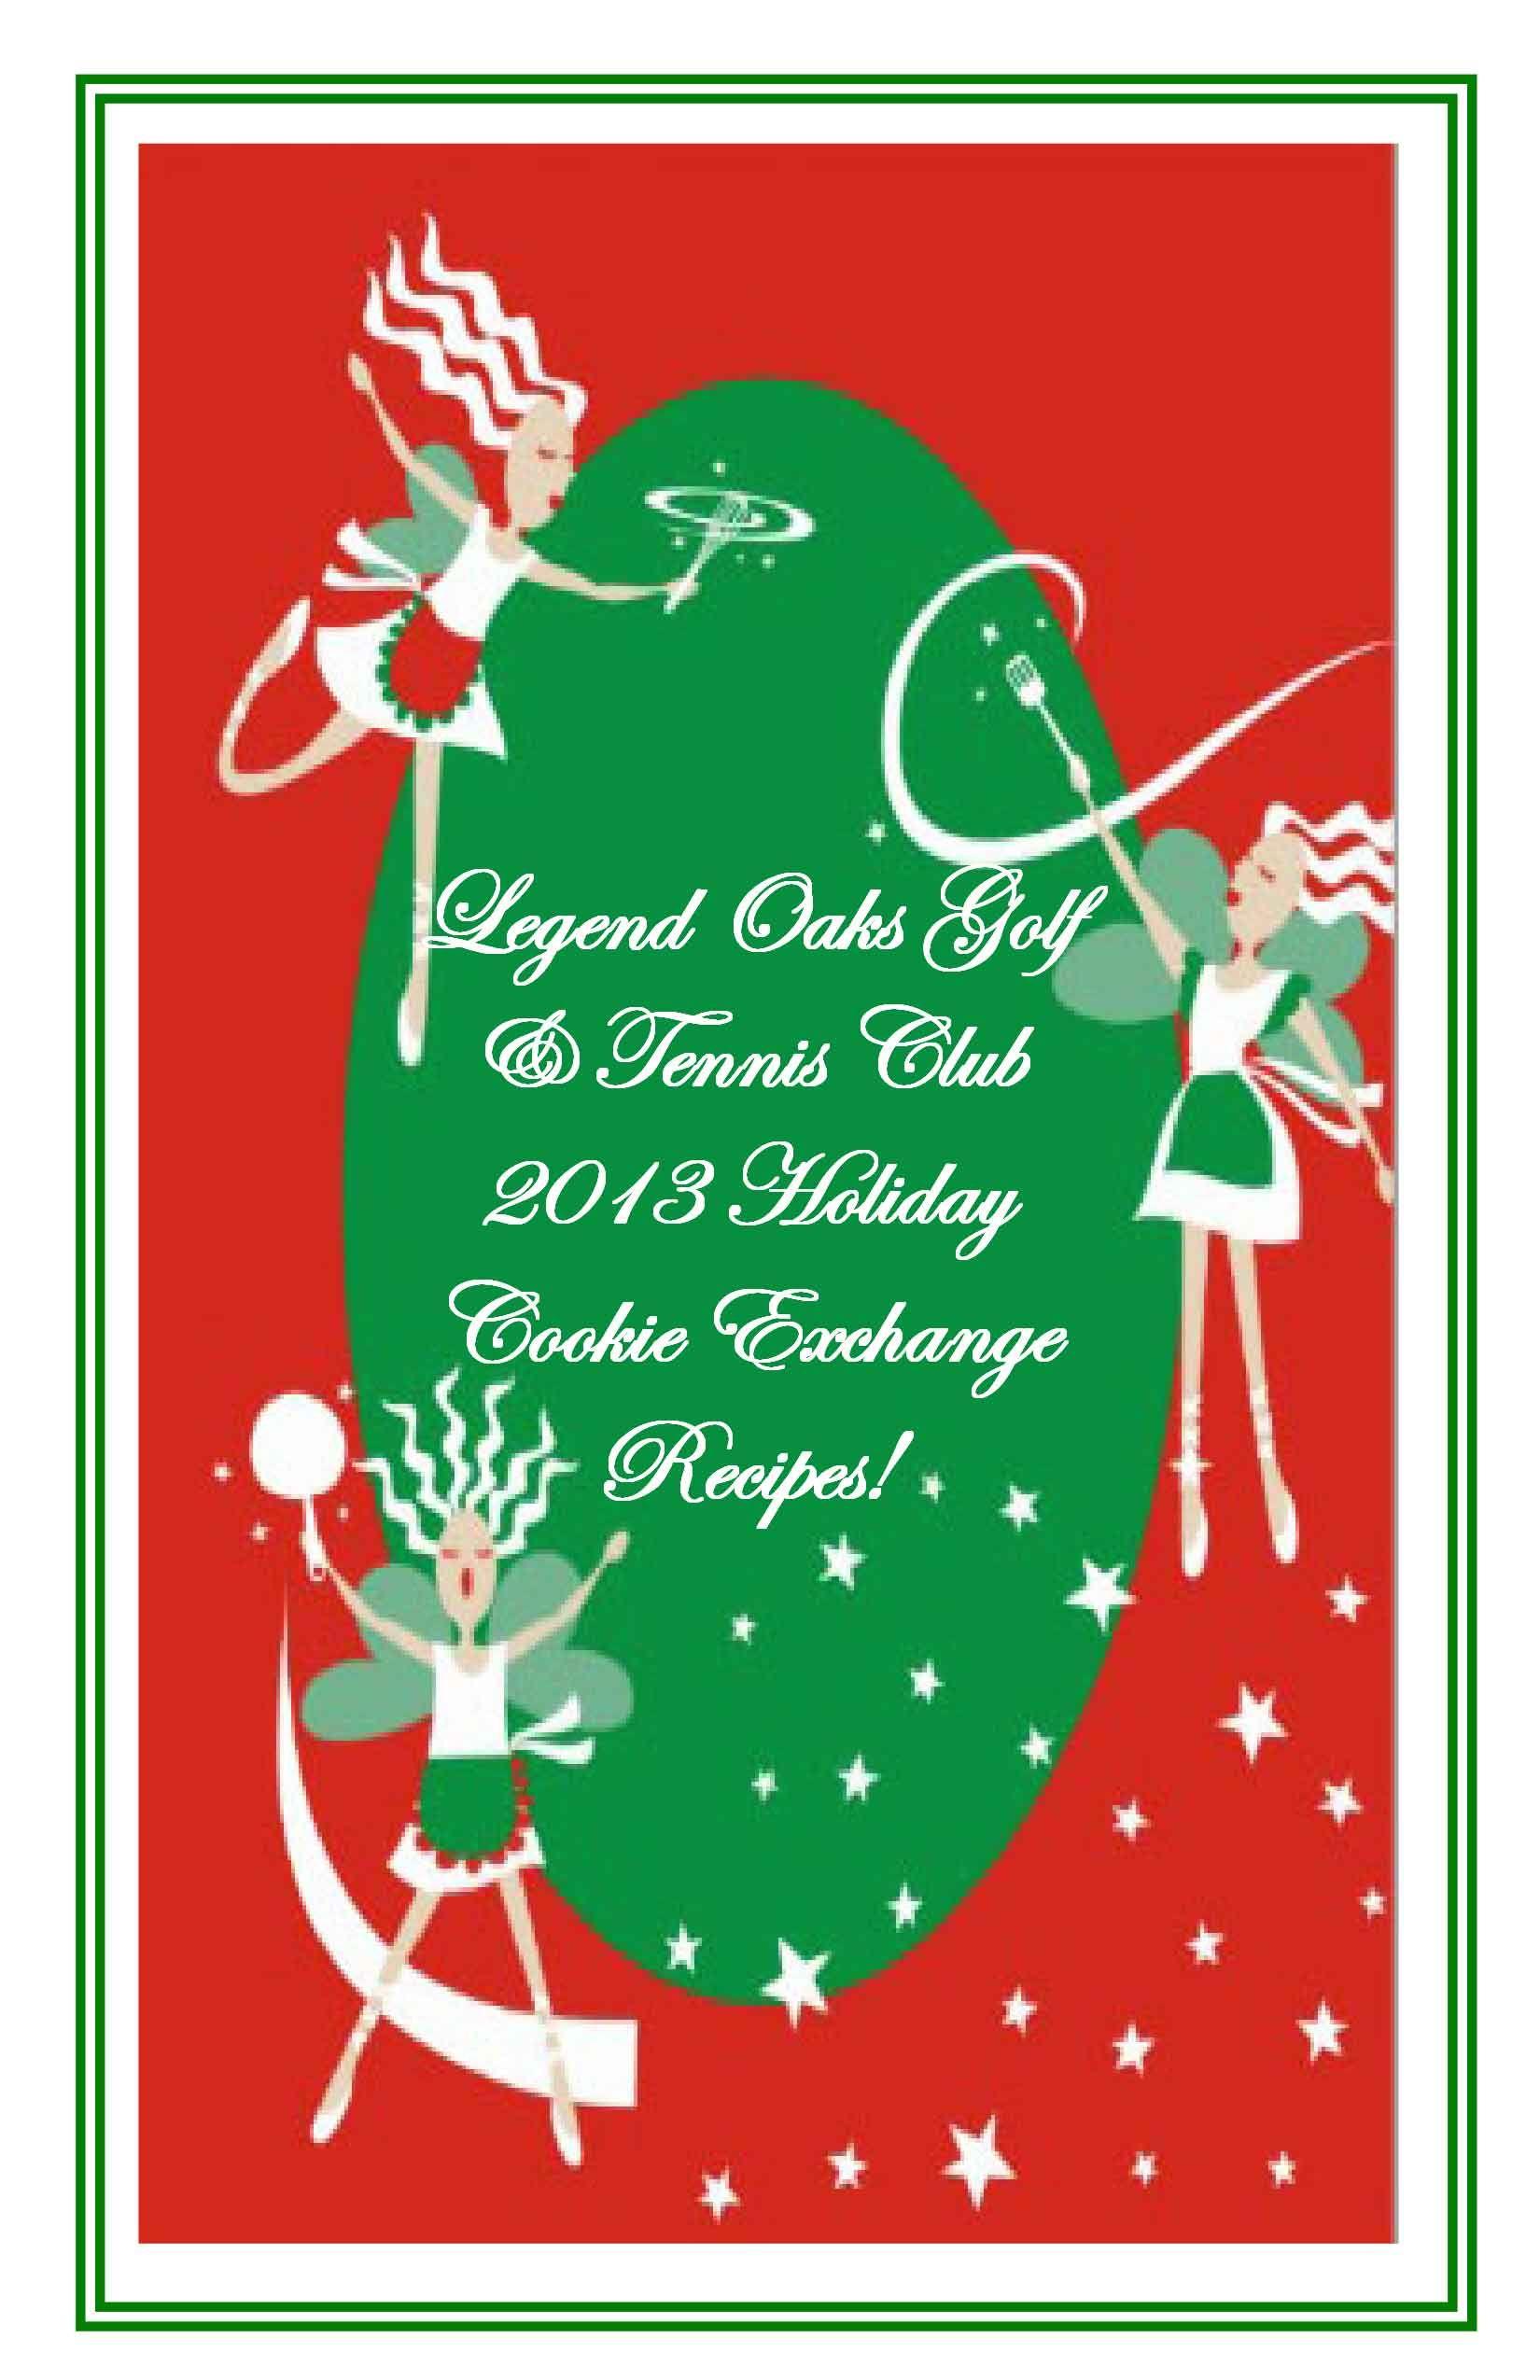 2013 Legend Oaks Christmas Cookie Exchange Recipe Booklet!